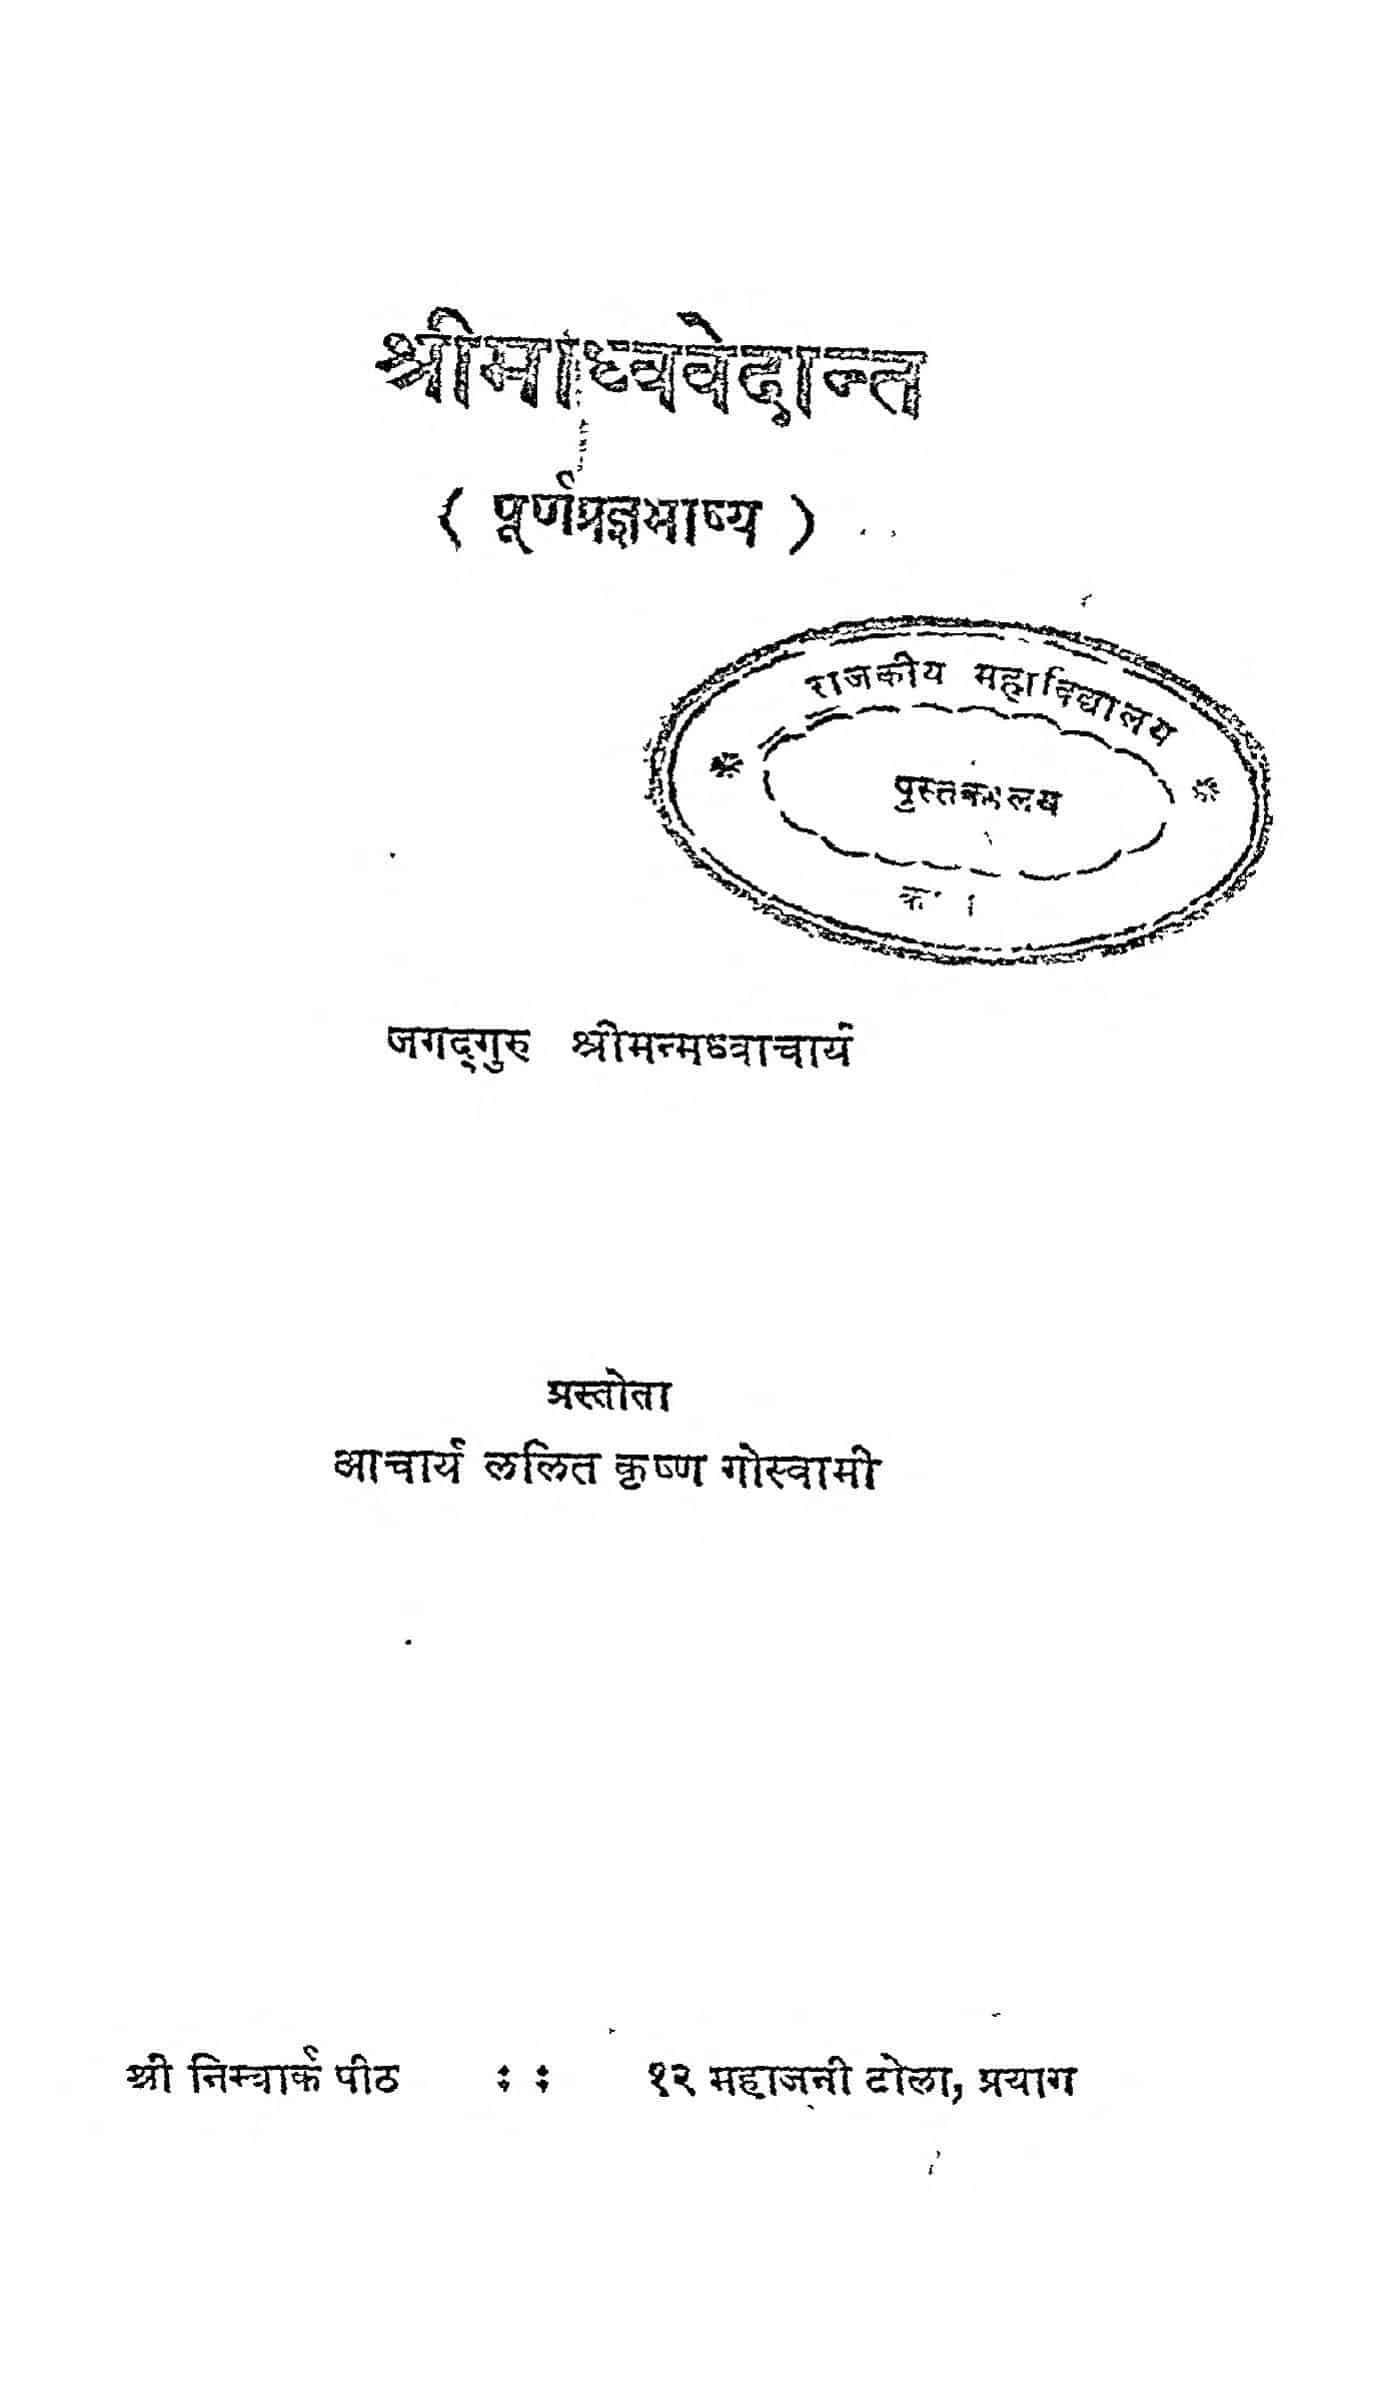 Book Image : श्रीमाध्ववेदान्त - Shree Madhav Vedant